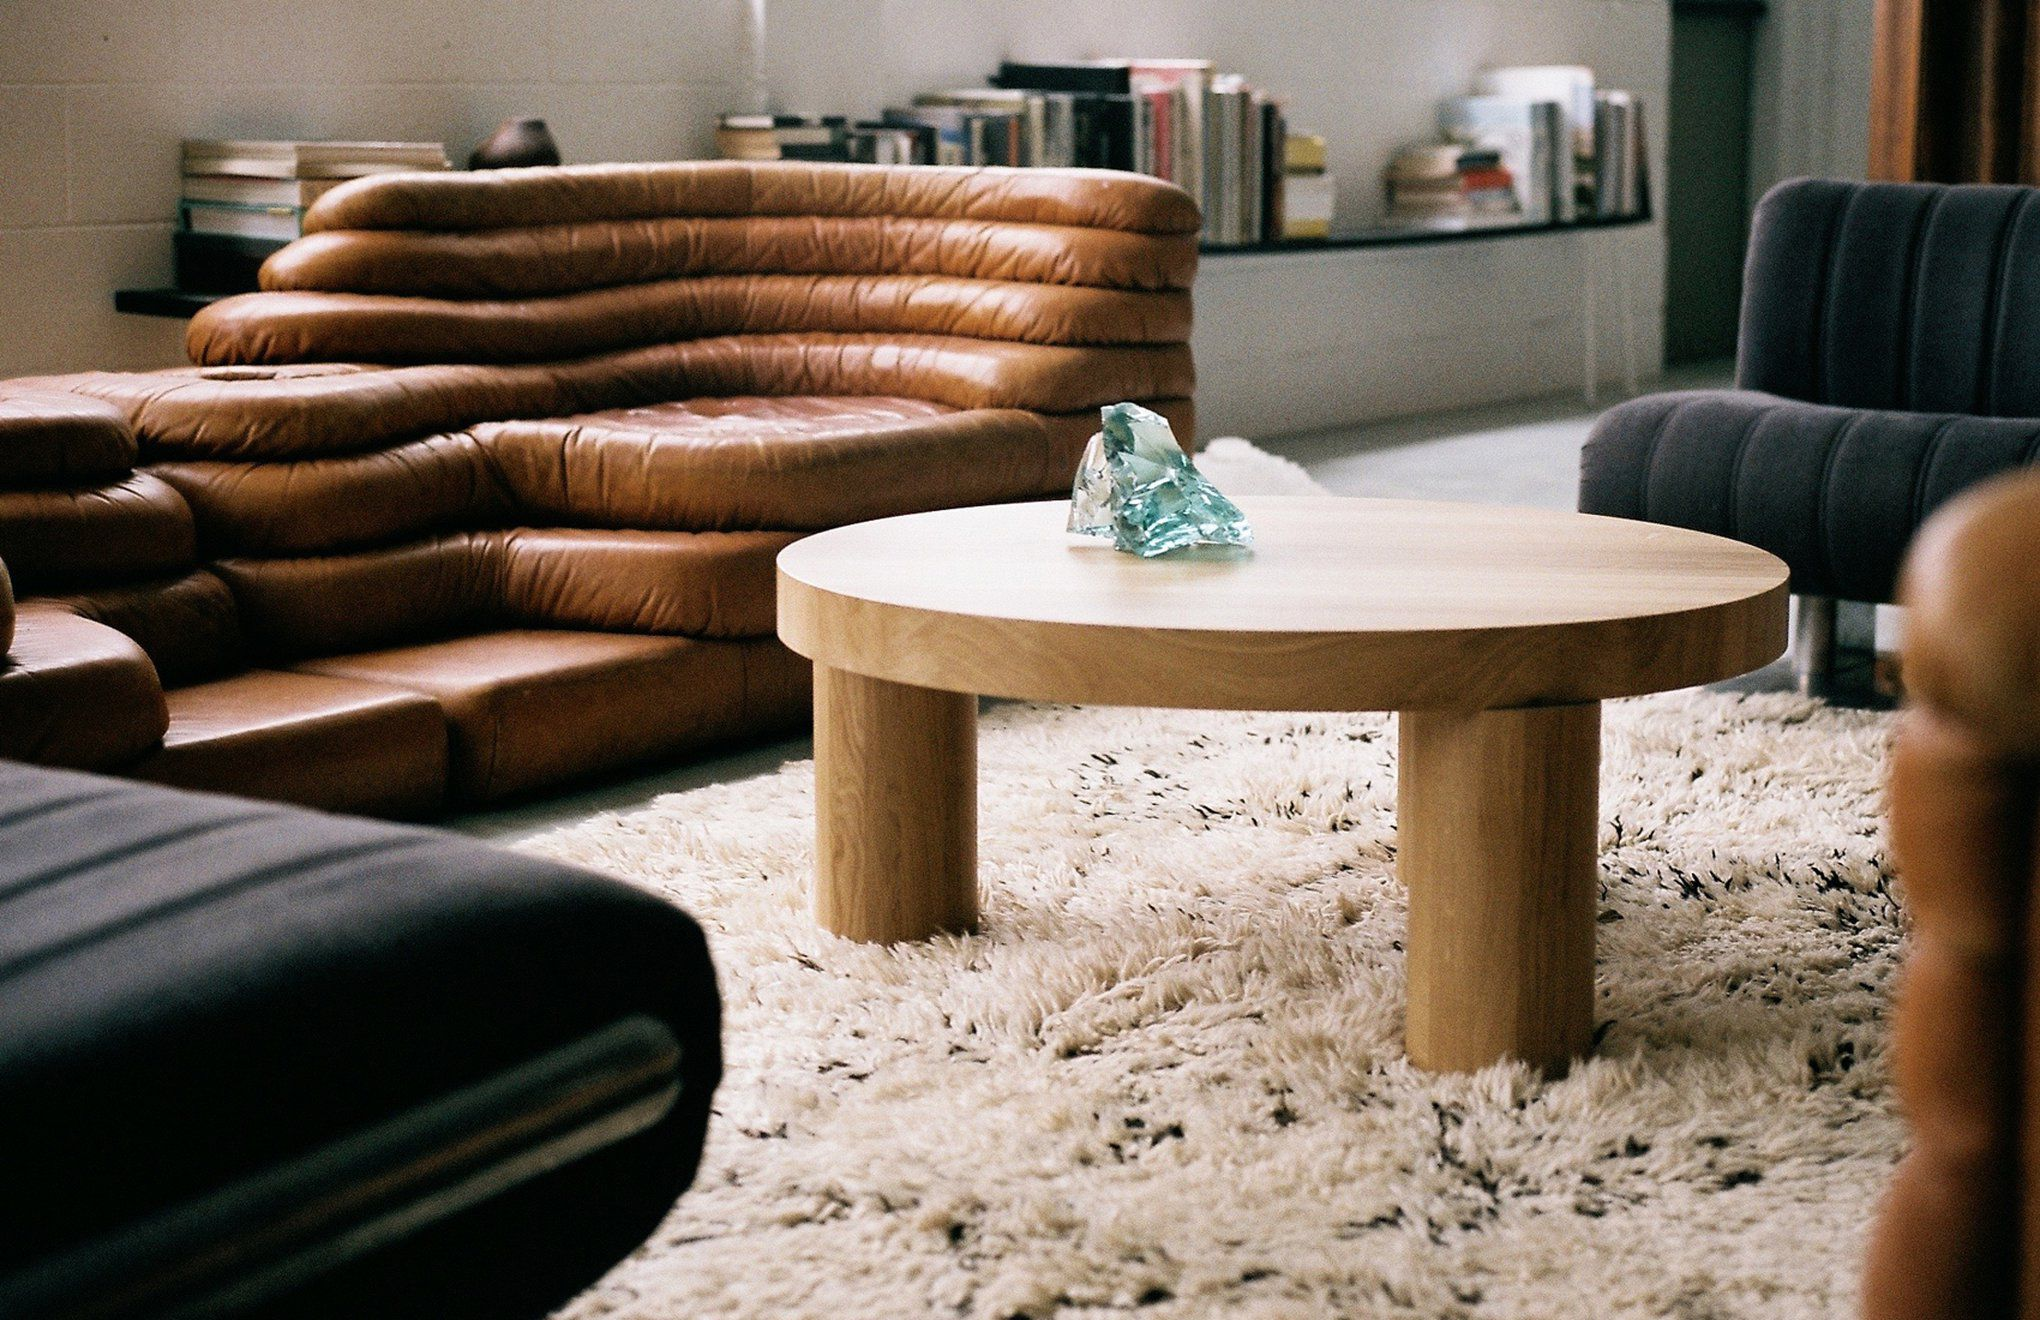 Tavolino basso moderno in quercia tondo da interno offset